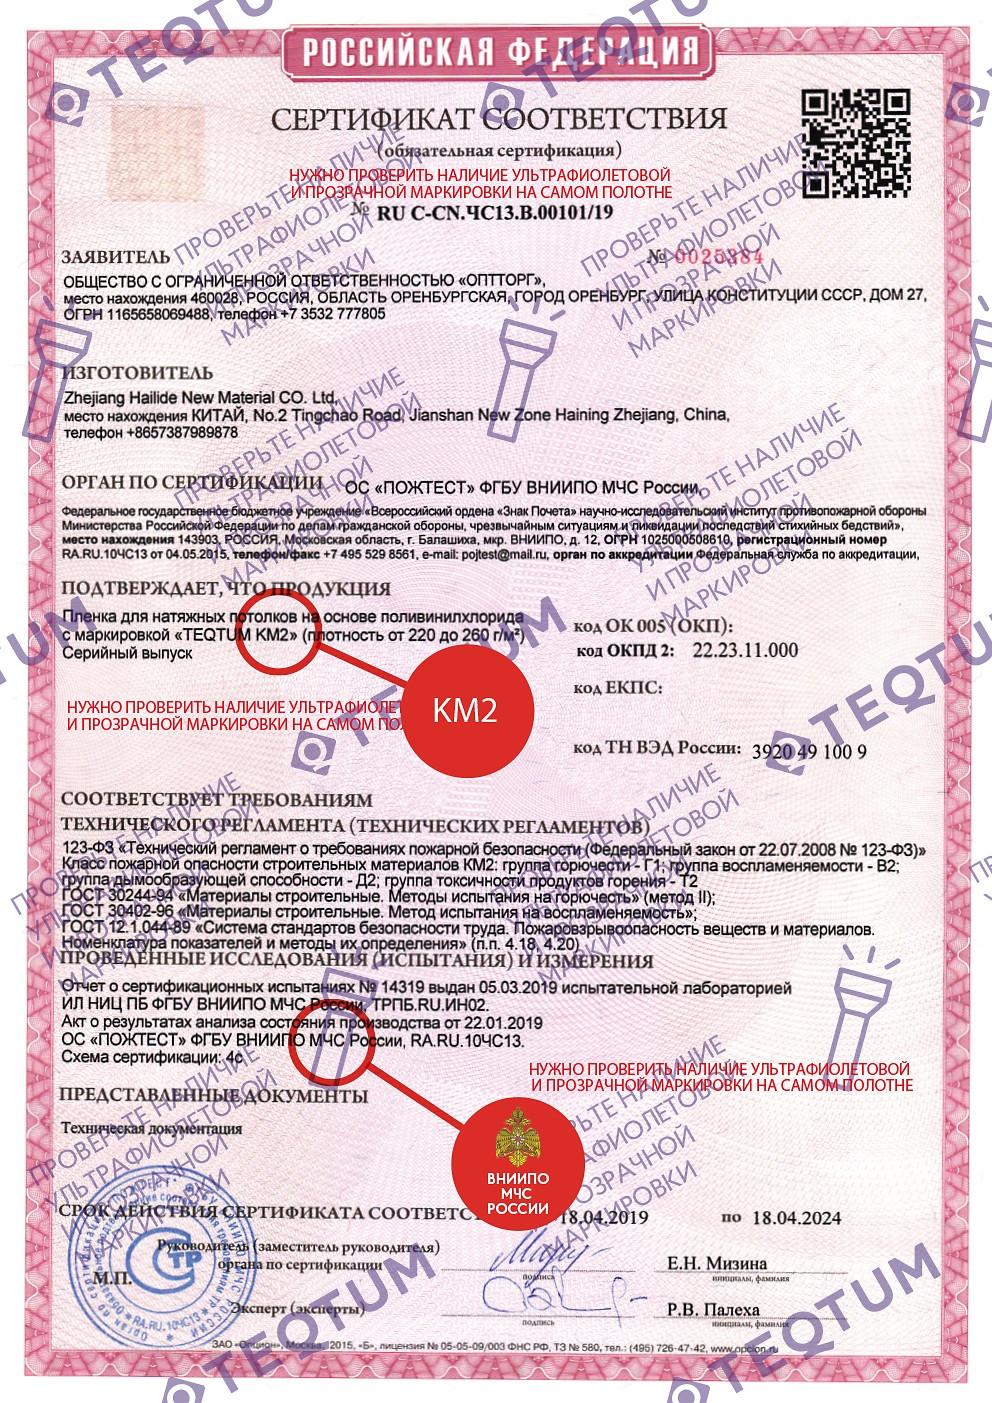 Сертификат соответствия Teqtum